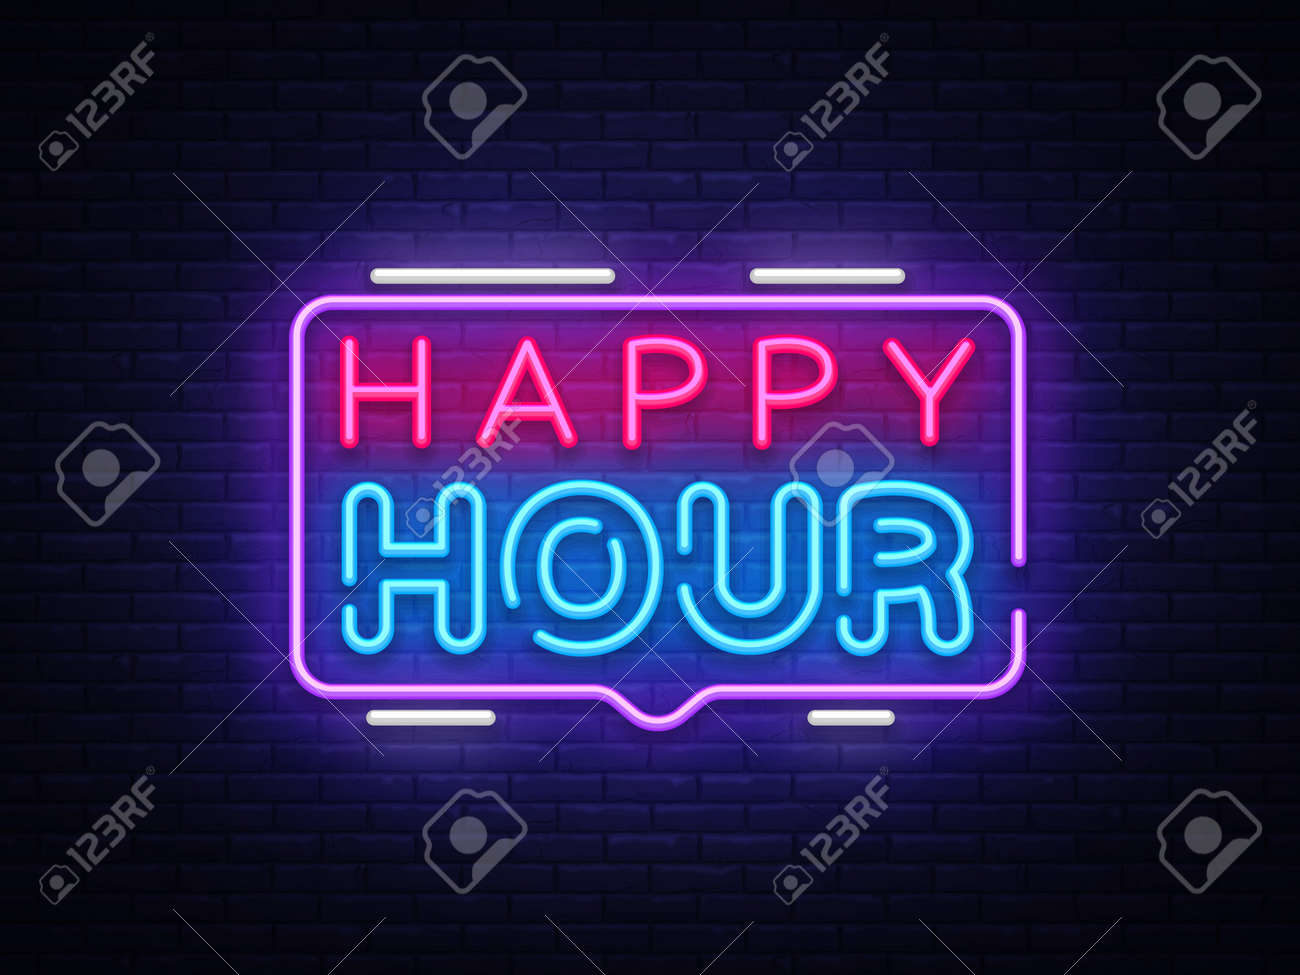 Happy Hour neon sign vector design template. Happy Hour neon logo, light banner design element colorful modern design trend, night bright advertising, brightsign. Vector illustration - 105170317